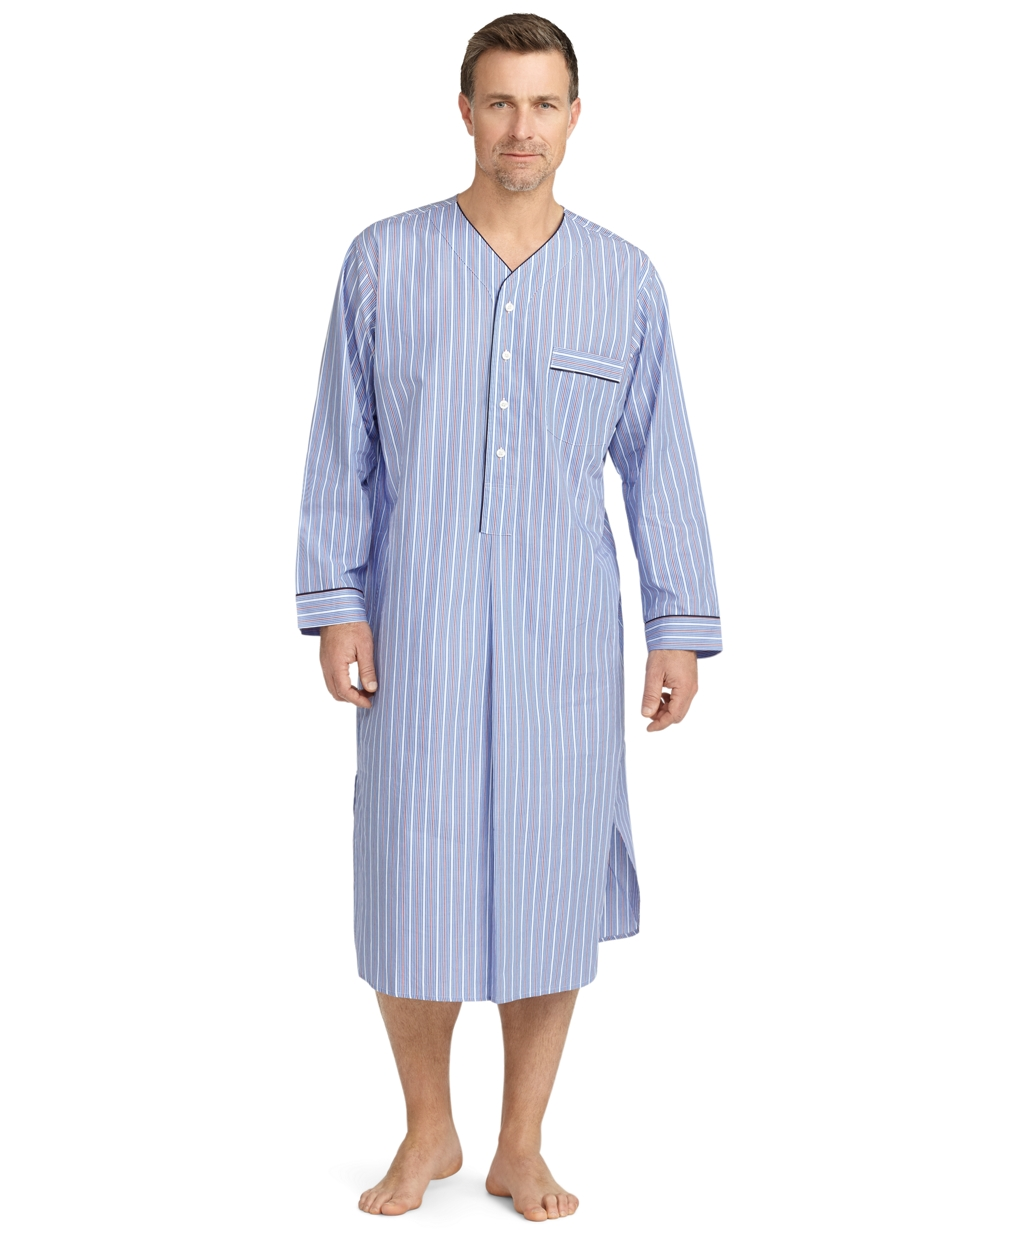 Lyst - Brooks Brothers Alternating Stripe Nightshirt in Blue for Men 86d7eaba8